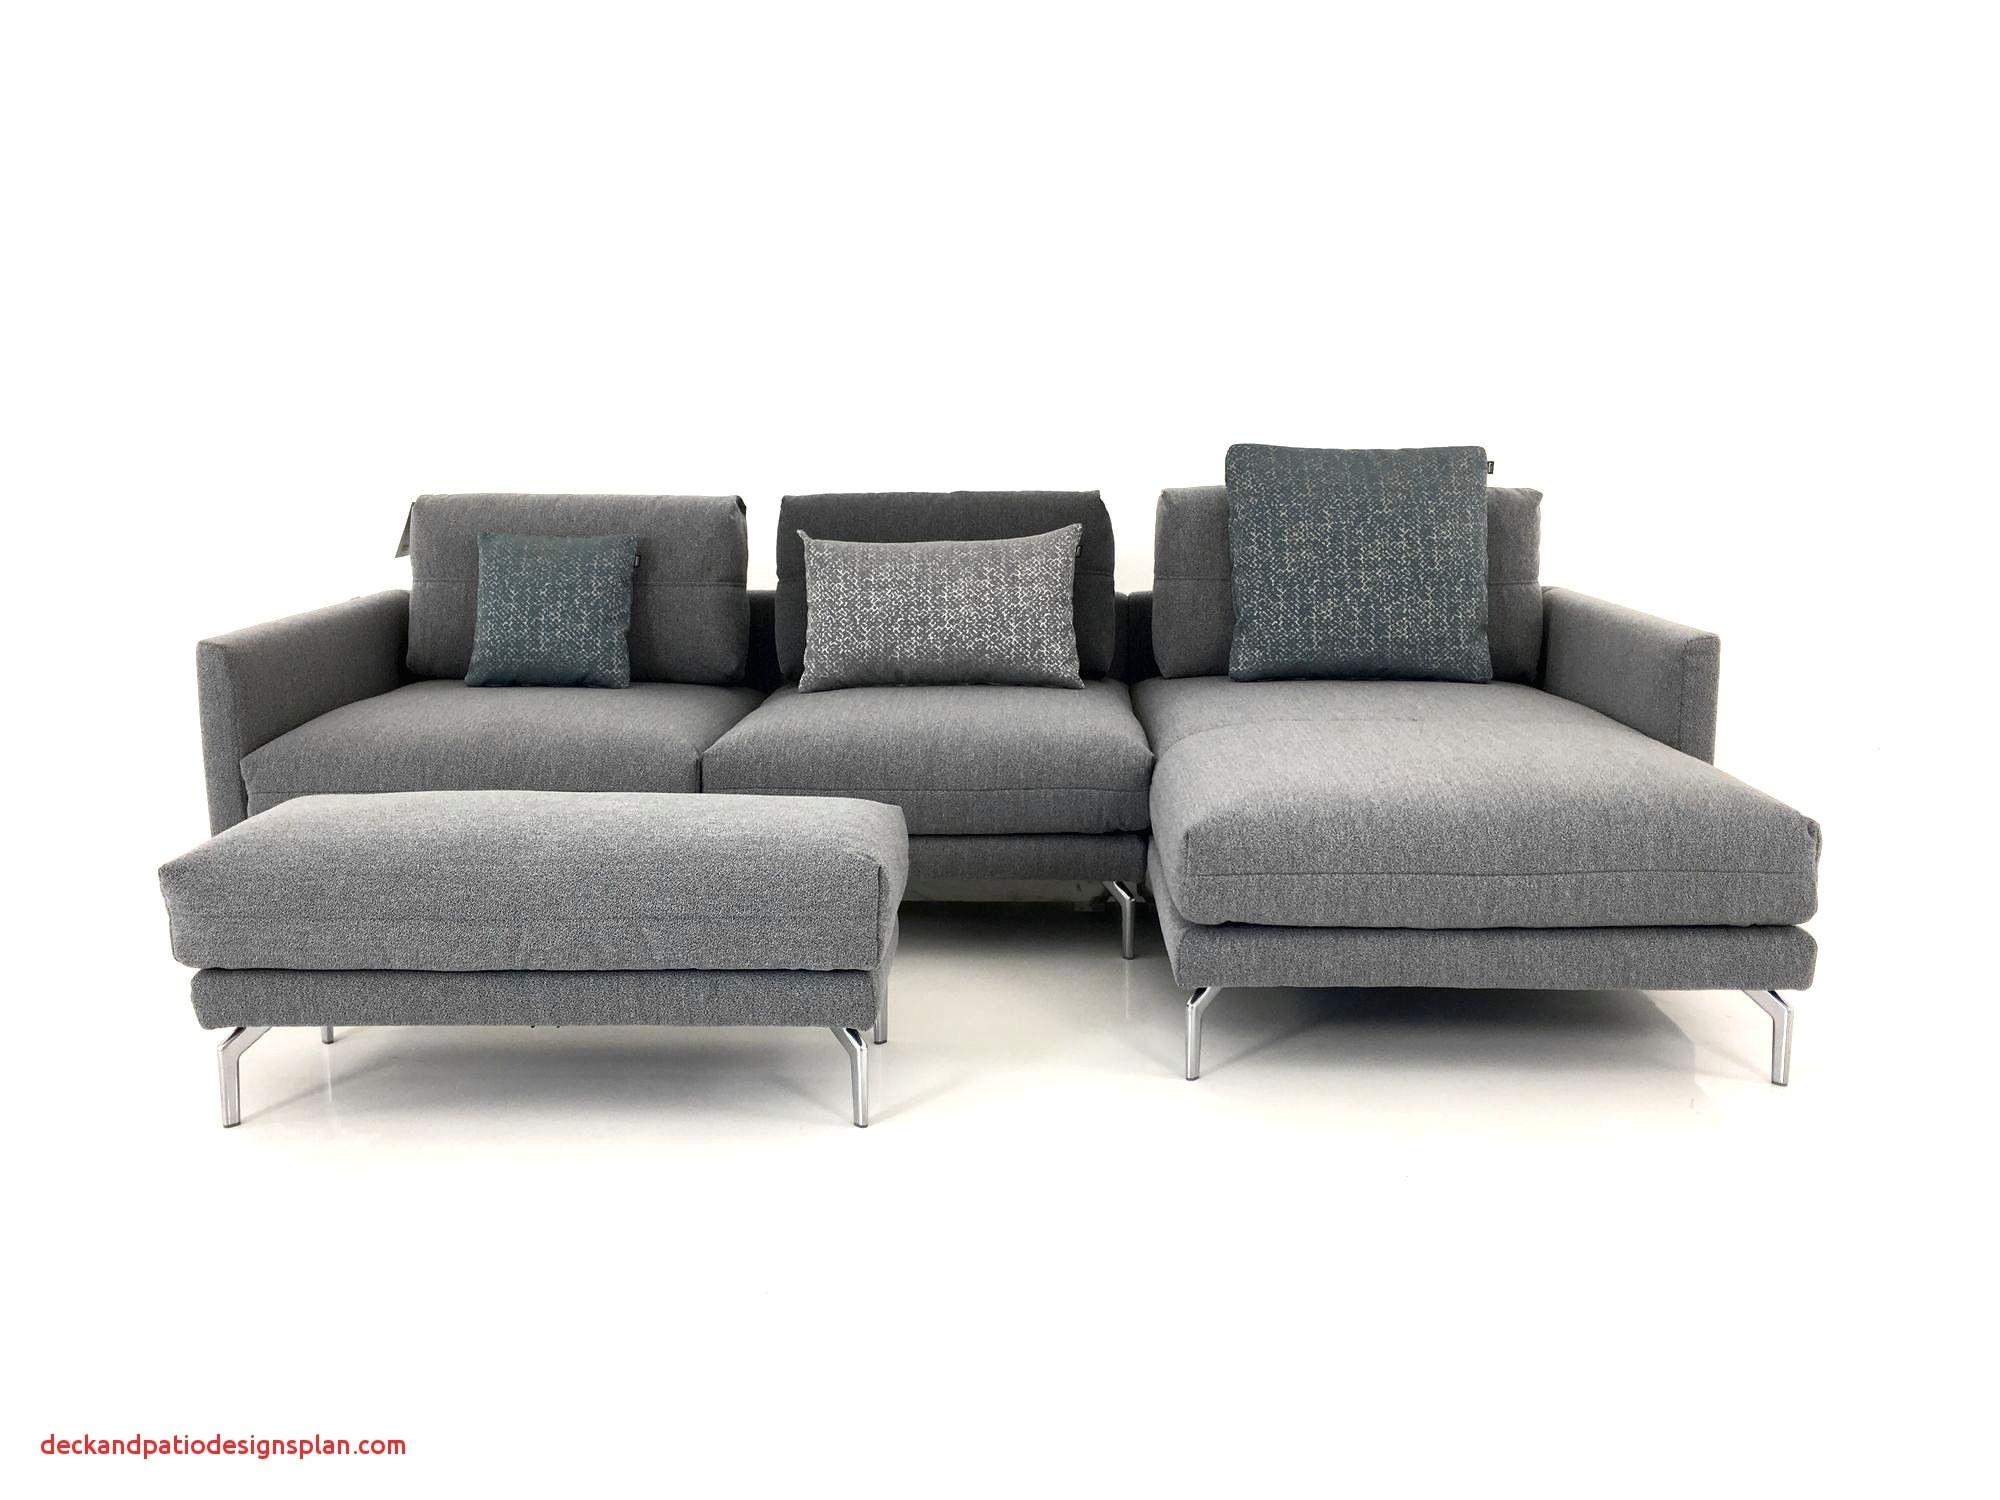 couch recamiere neu sofa grau ikea luft sofa ikea luxus bmw x3 2 0d